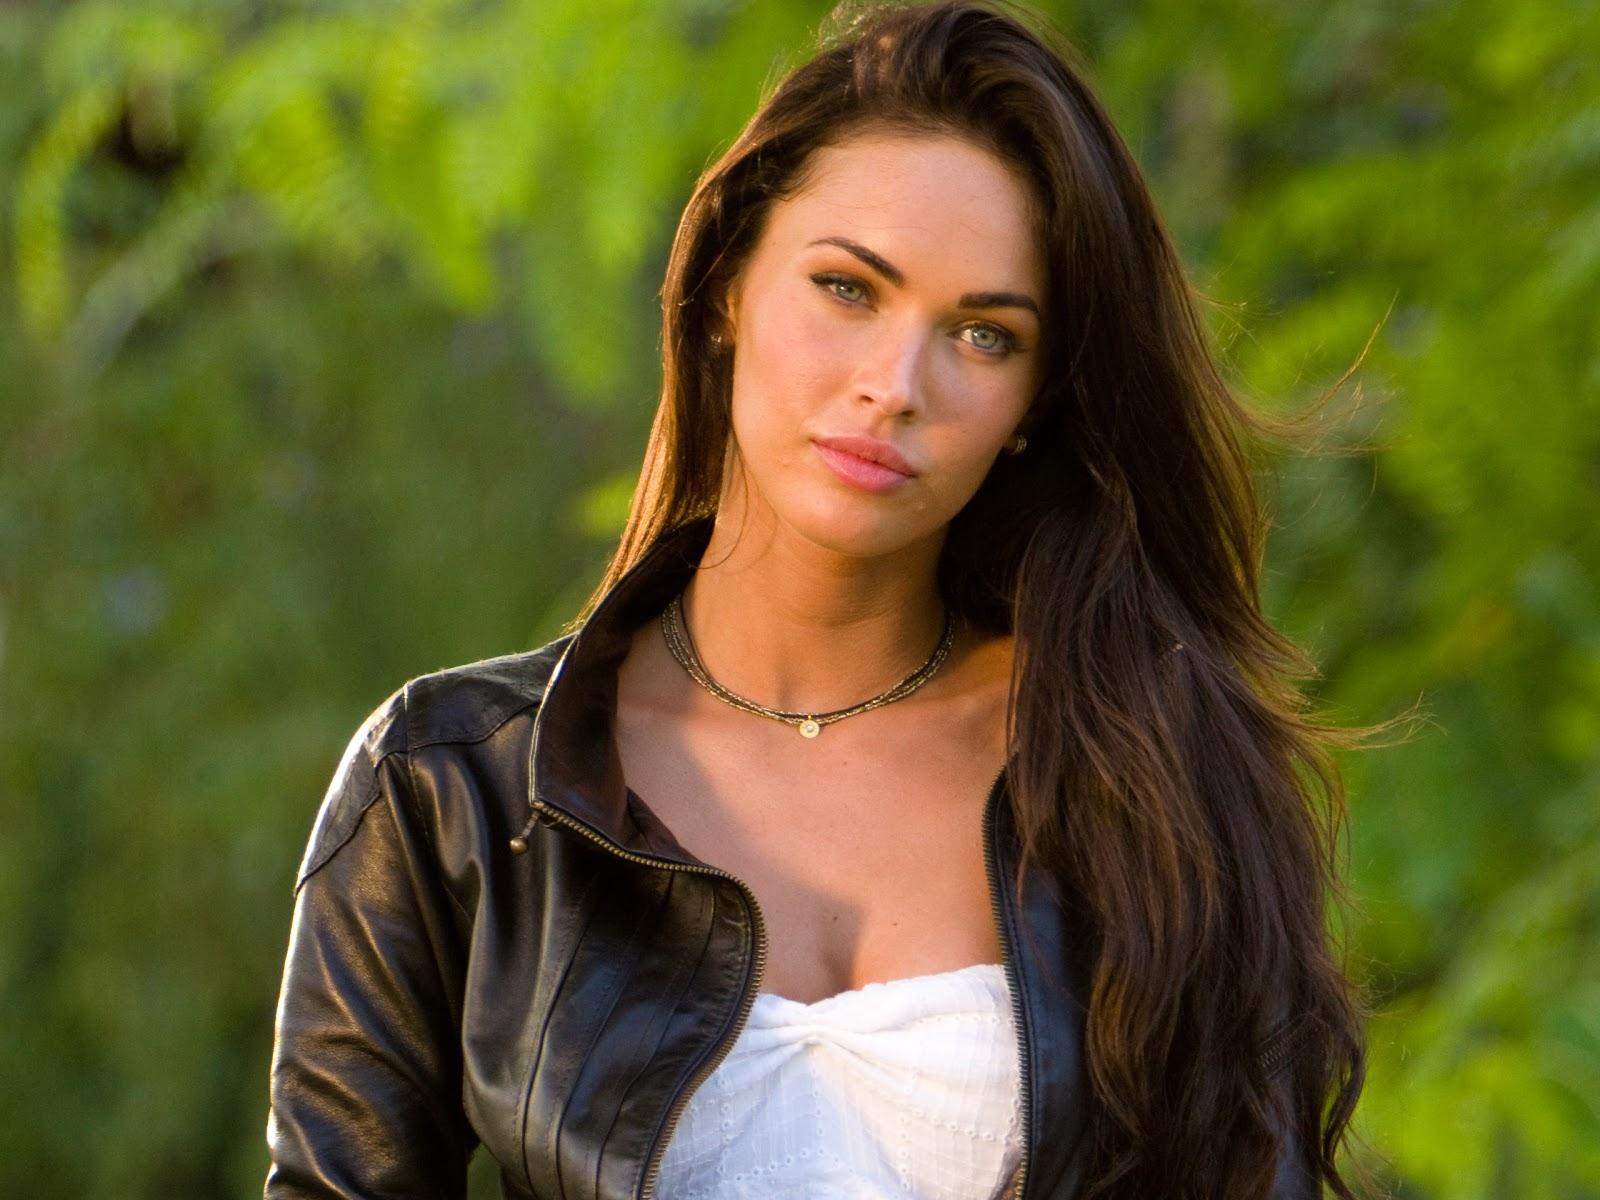 Megan Fox in Transformers 4